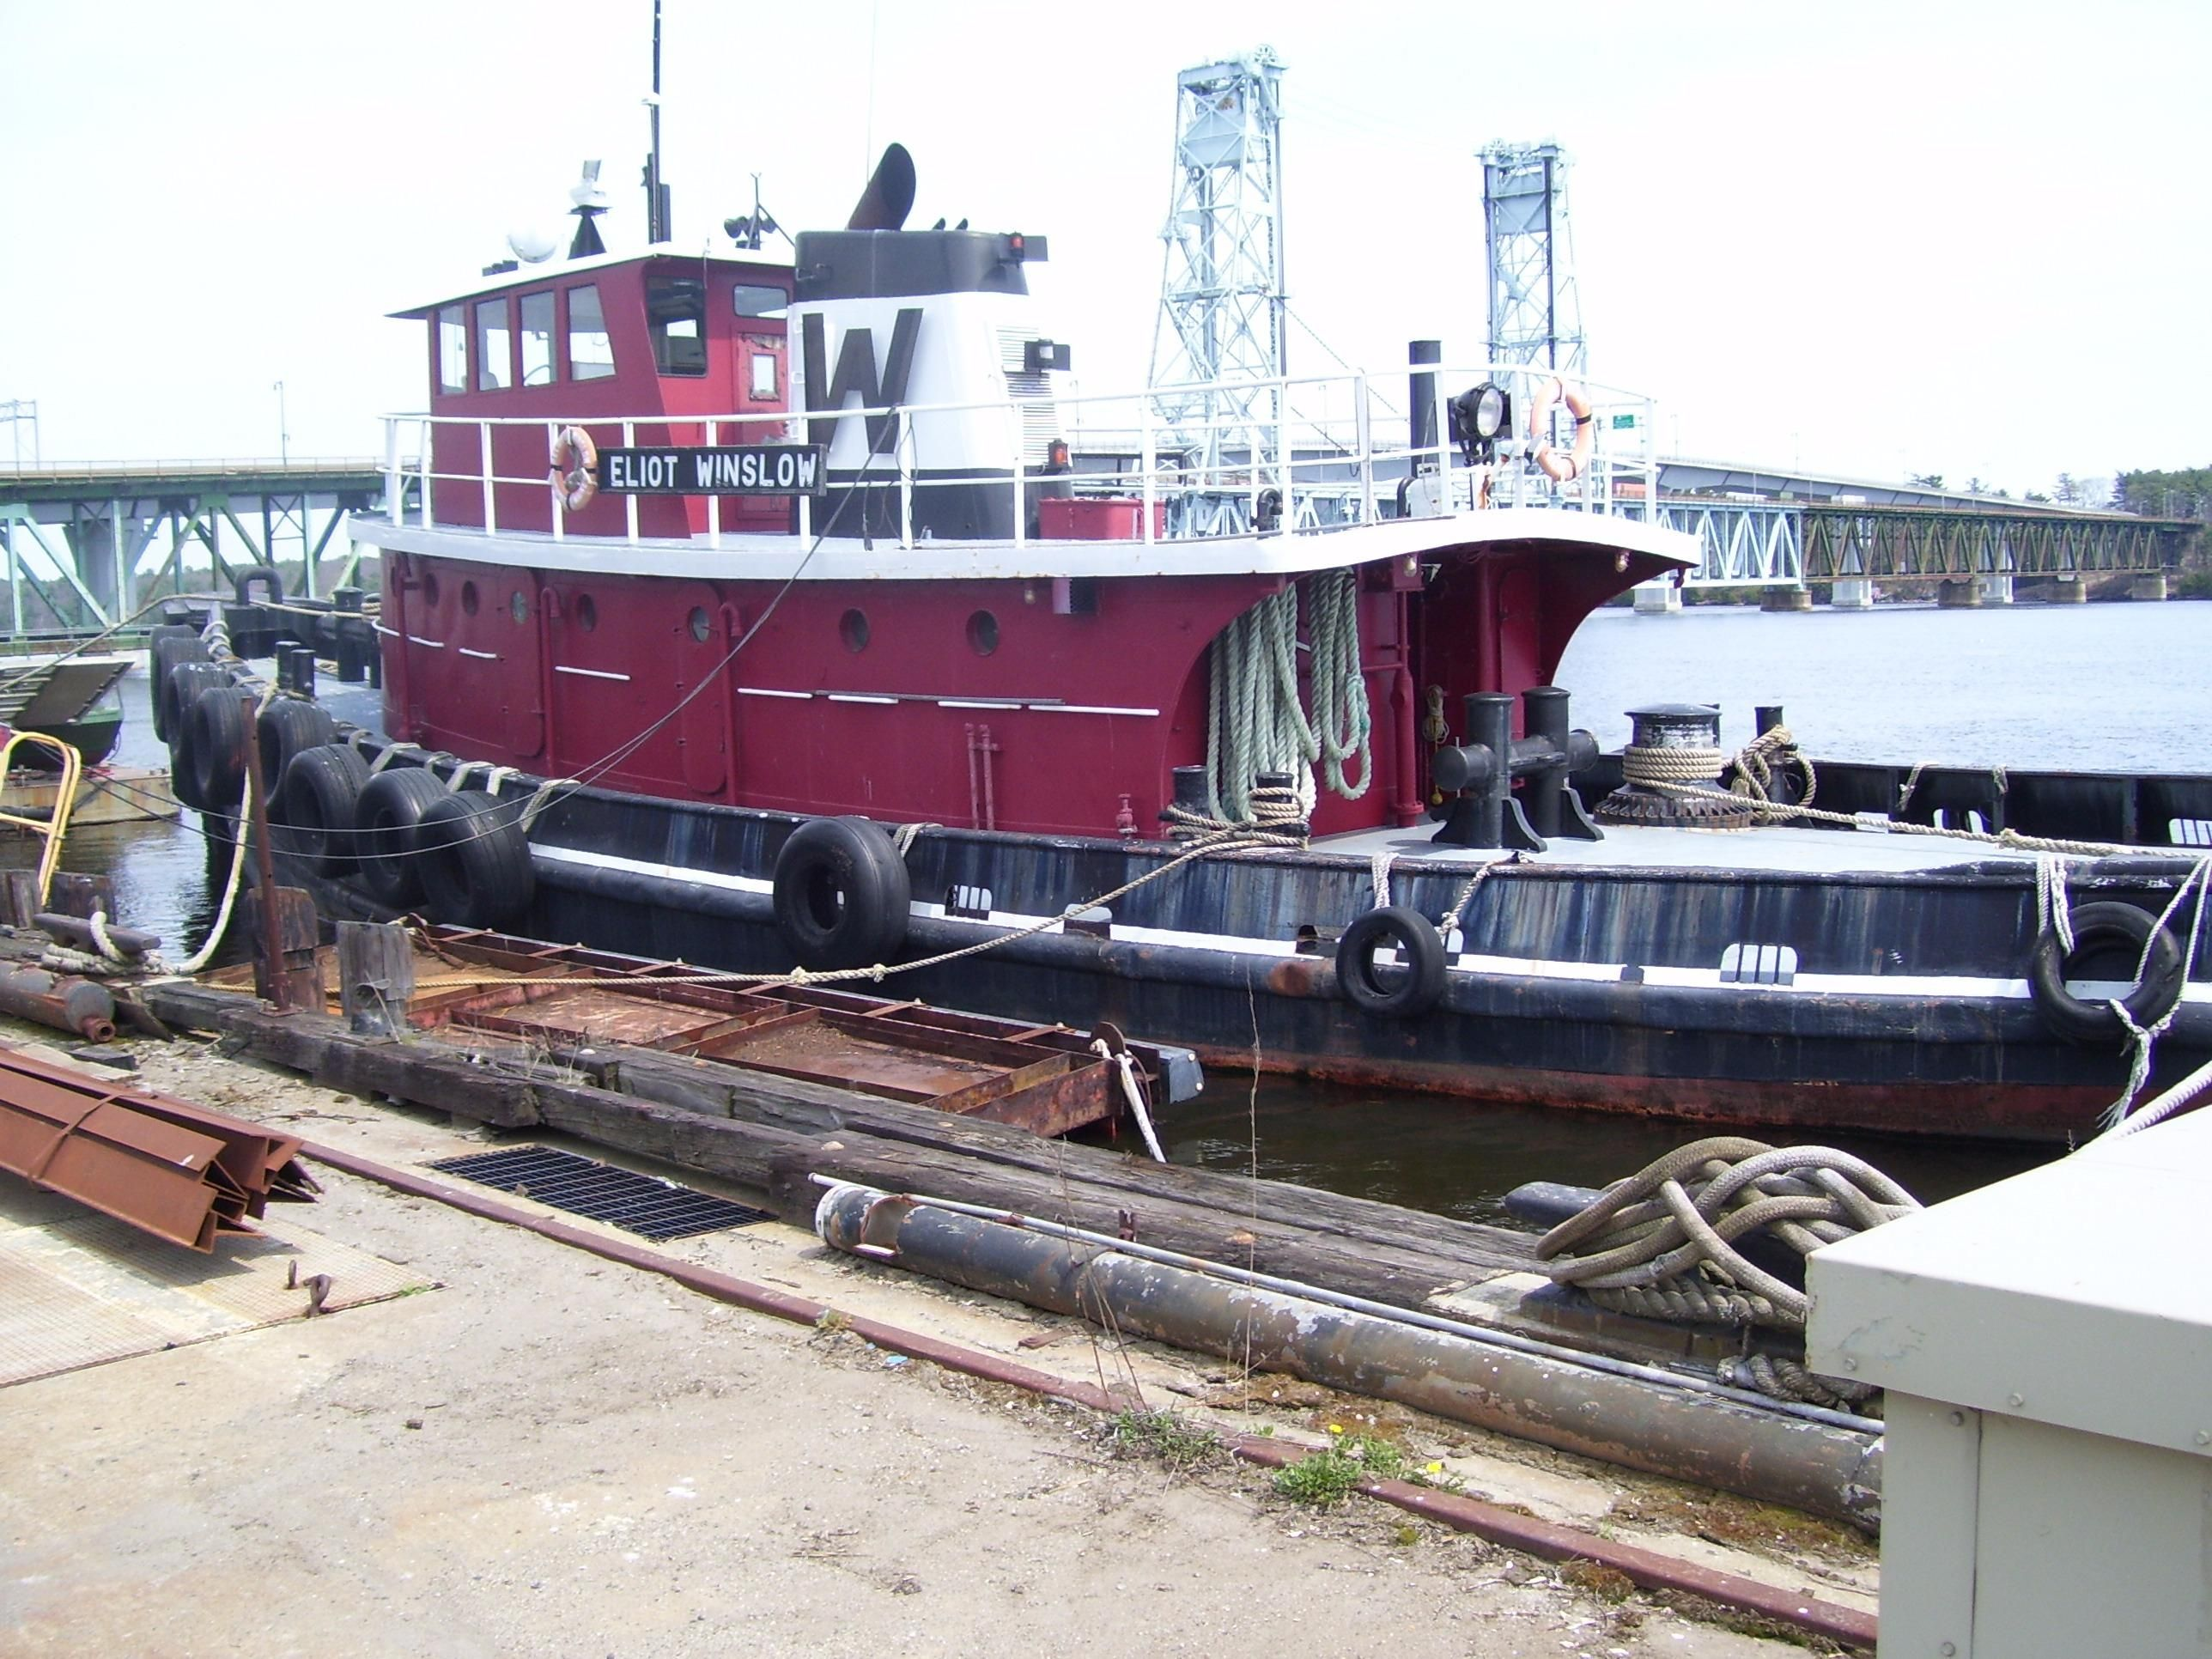 Boat dating sites - PILOT Automotive Labs